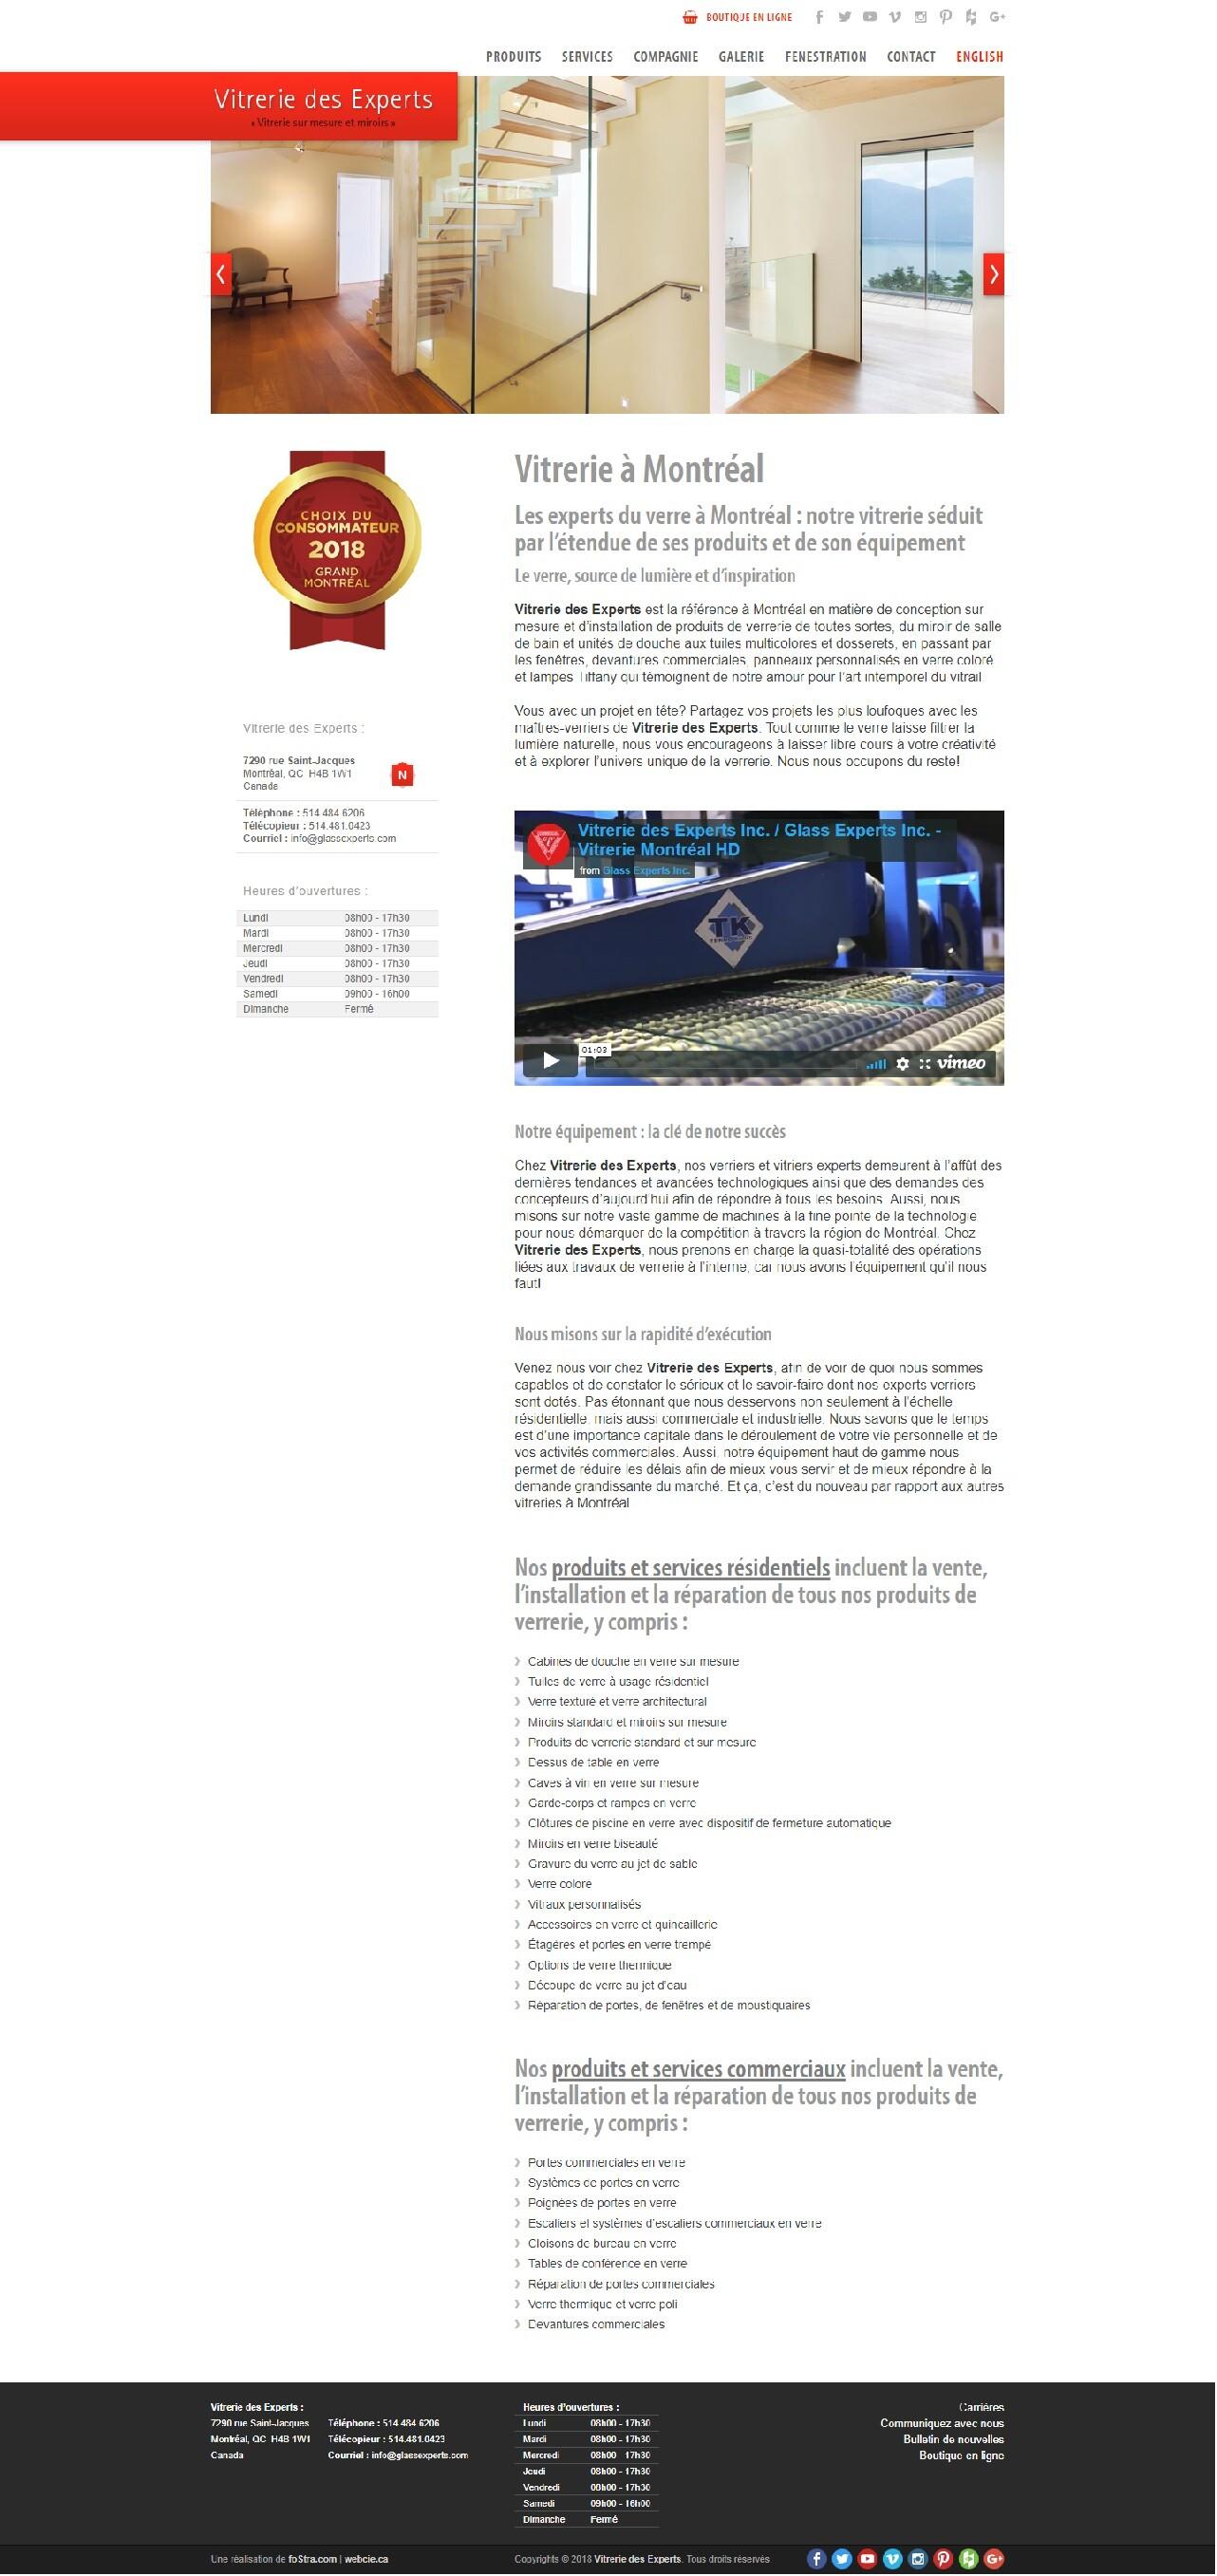 Vitrerie Des Experts, WebCie portfolio, photo